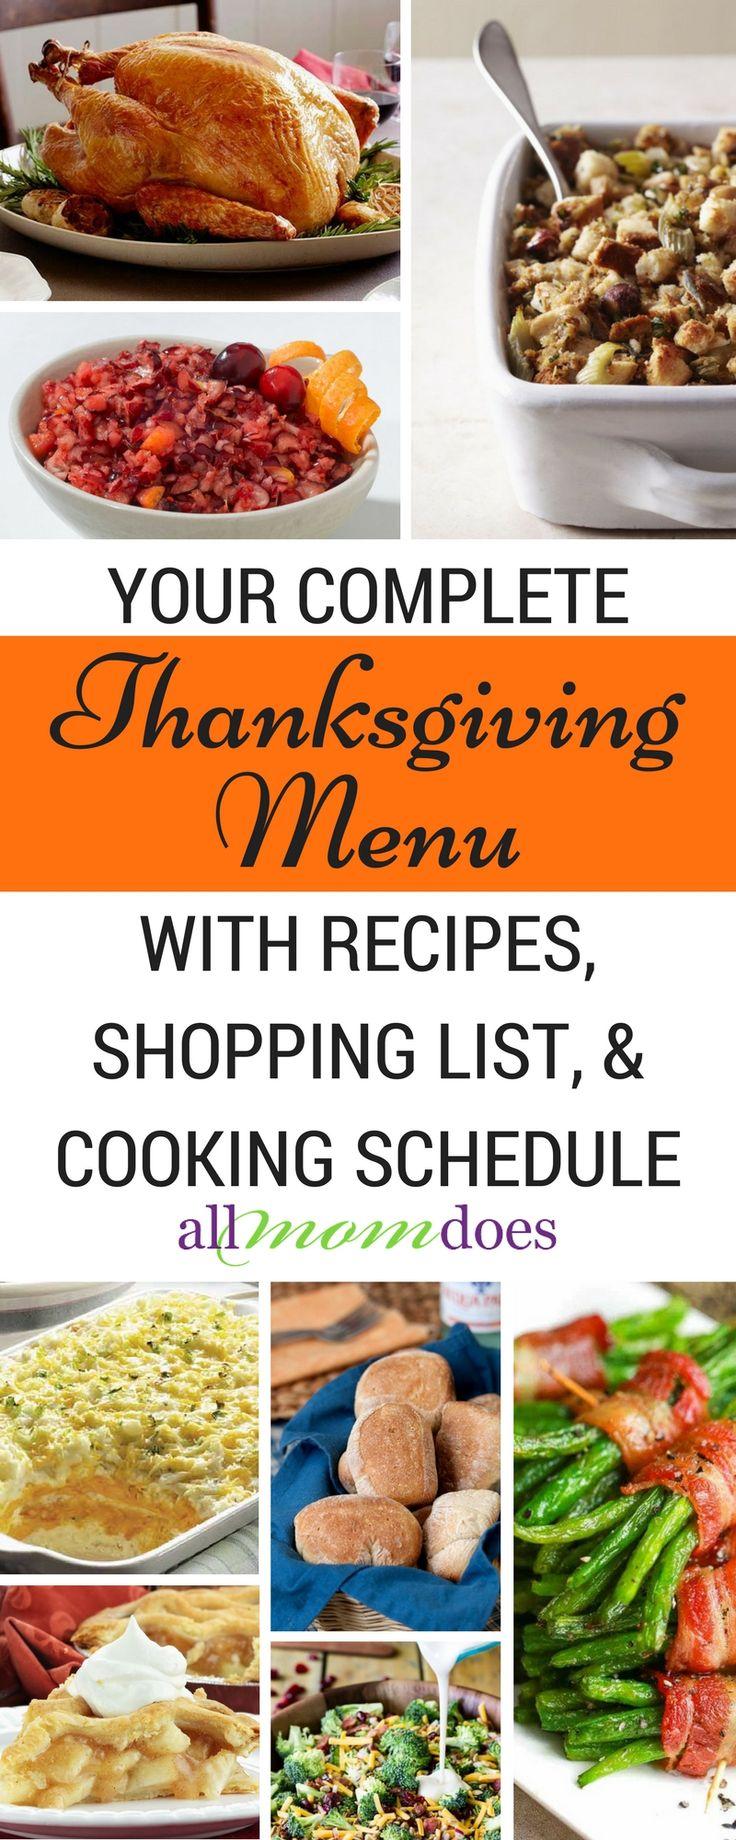 Complete Thanksgiving menu - recipes, shopping list, and cooking schedule. #thanksgivingmenu #thanksgivingschedule #thanksgivingrecipes